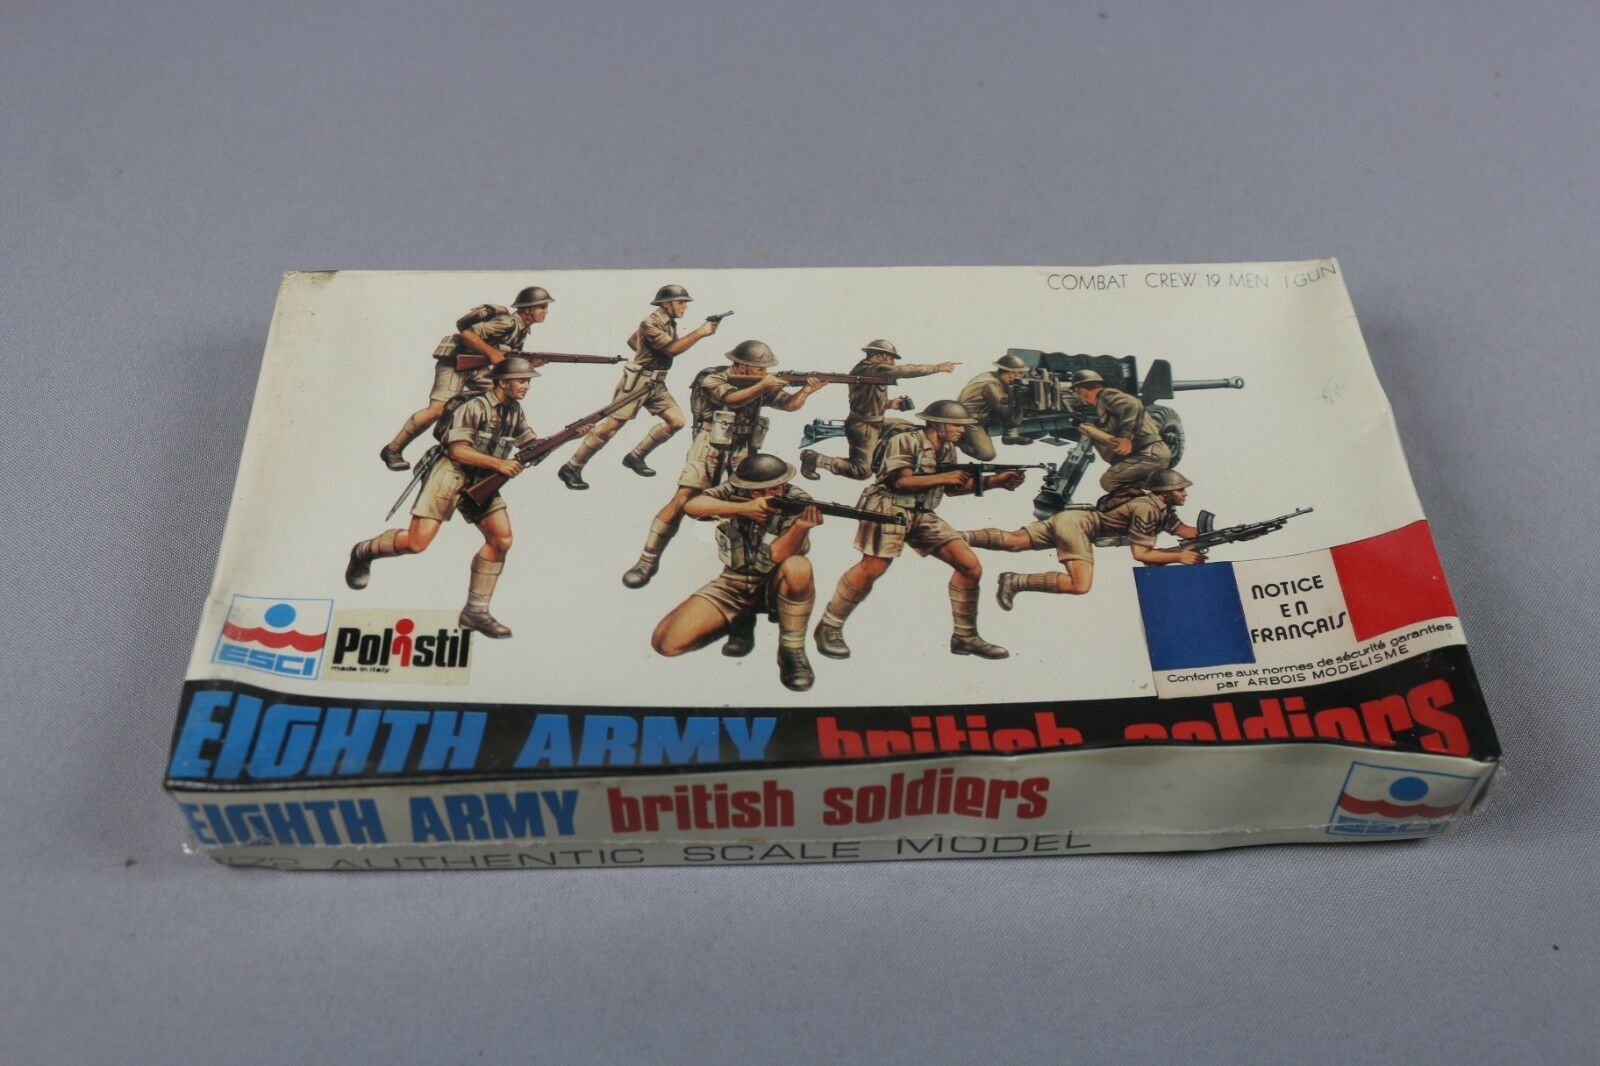 ZF1476 Esci 1 72 figurine militaire diorama 8019 Eighth Army British Soldiers